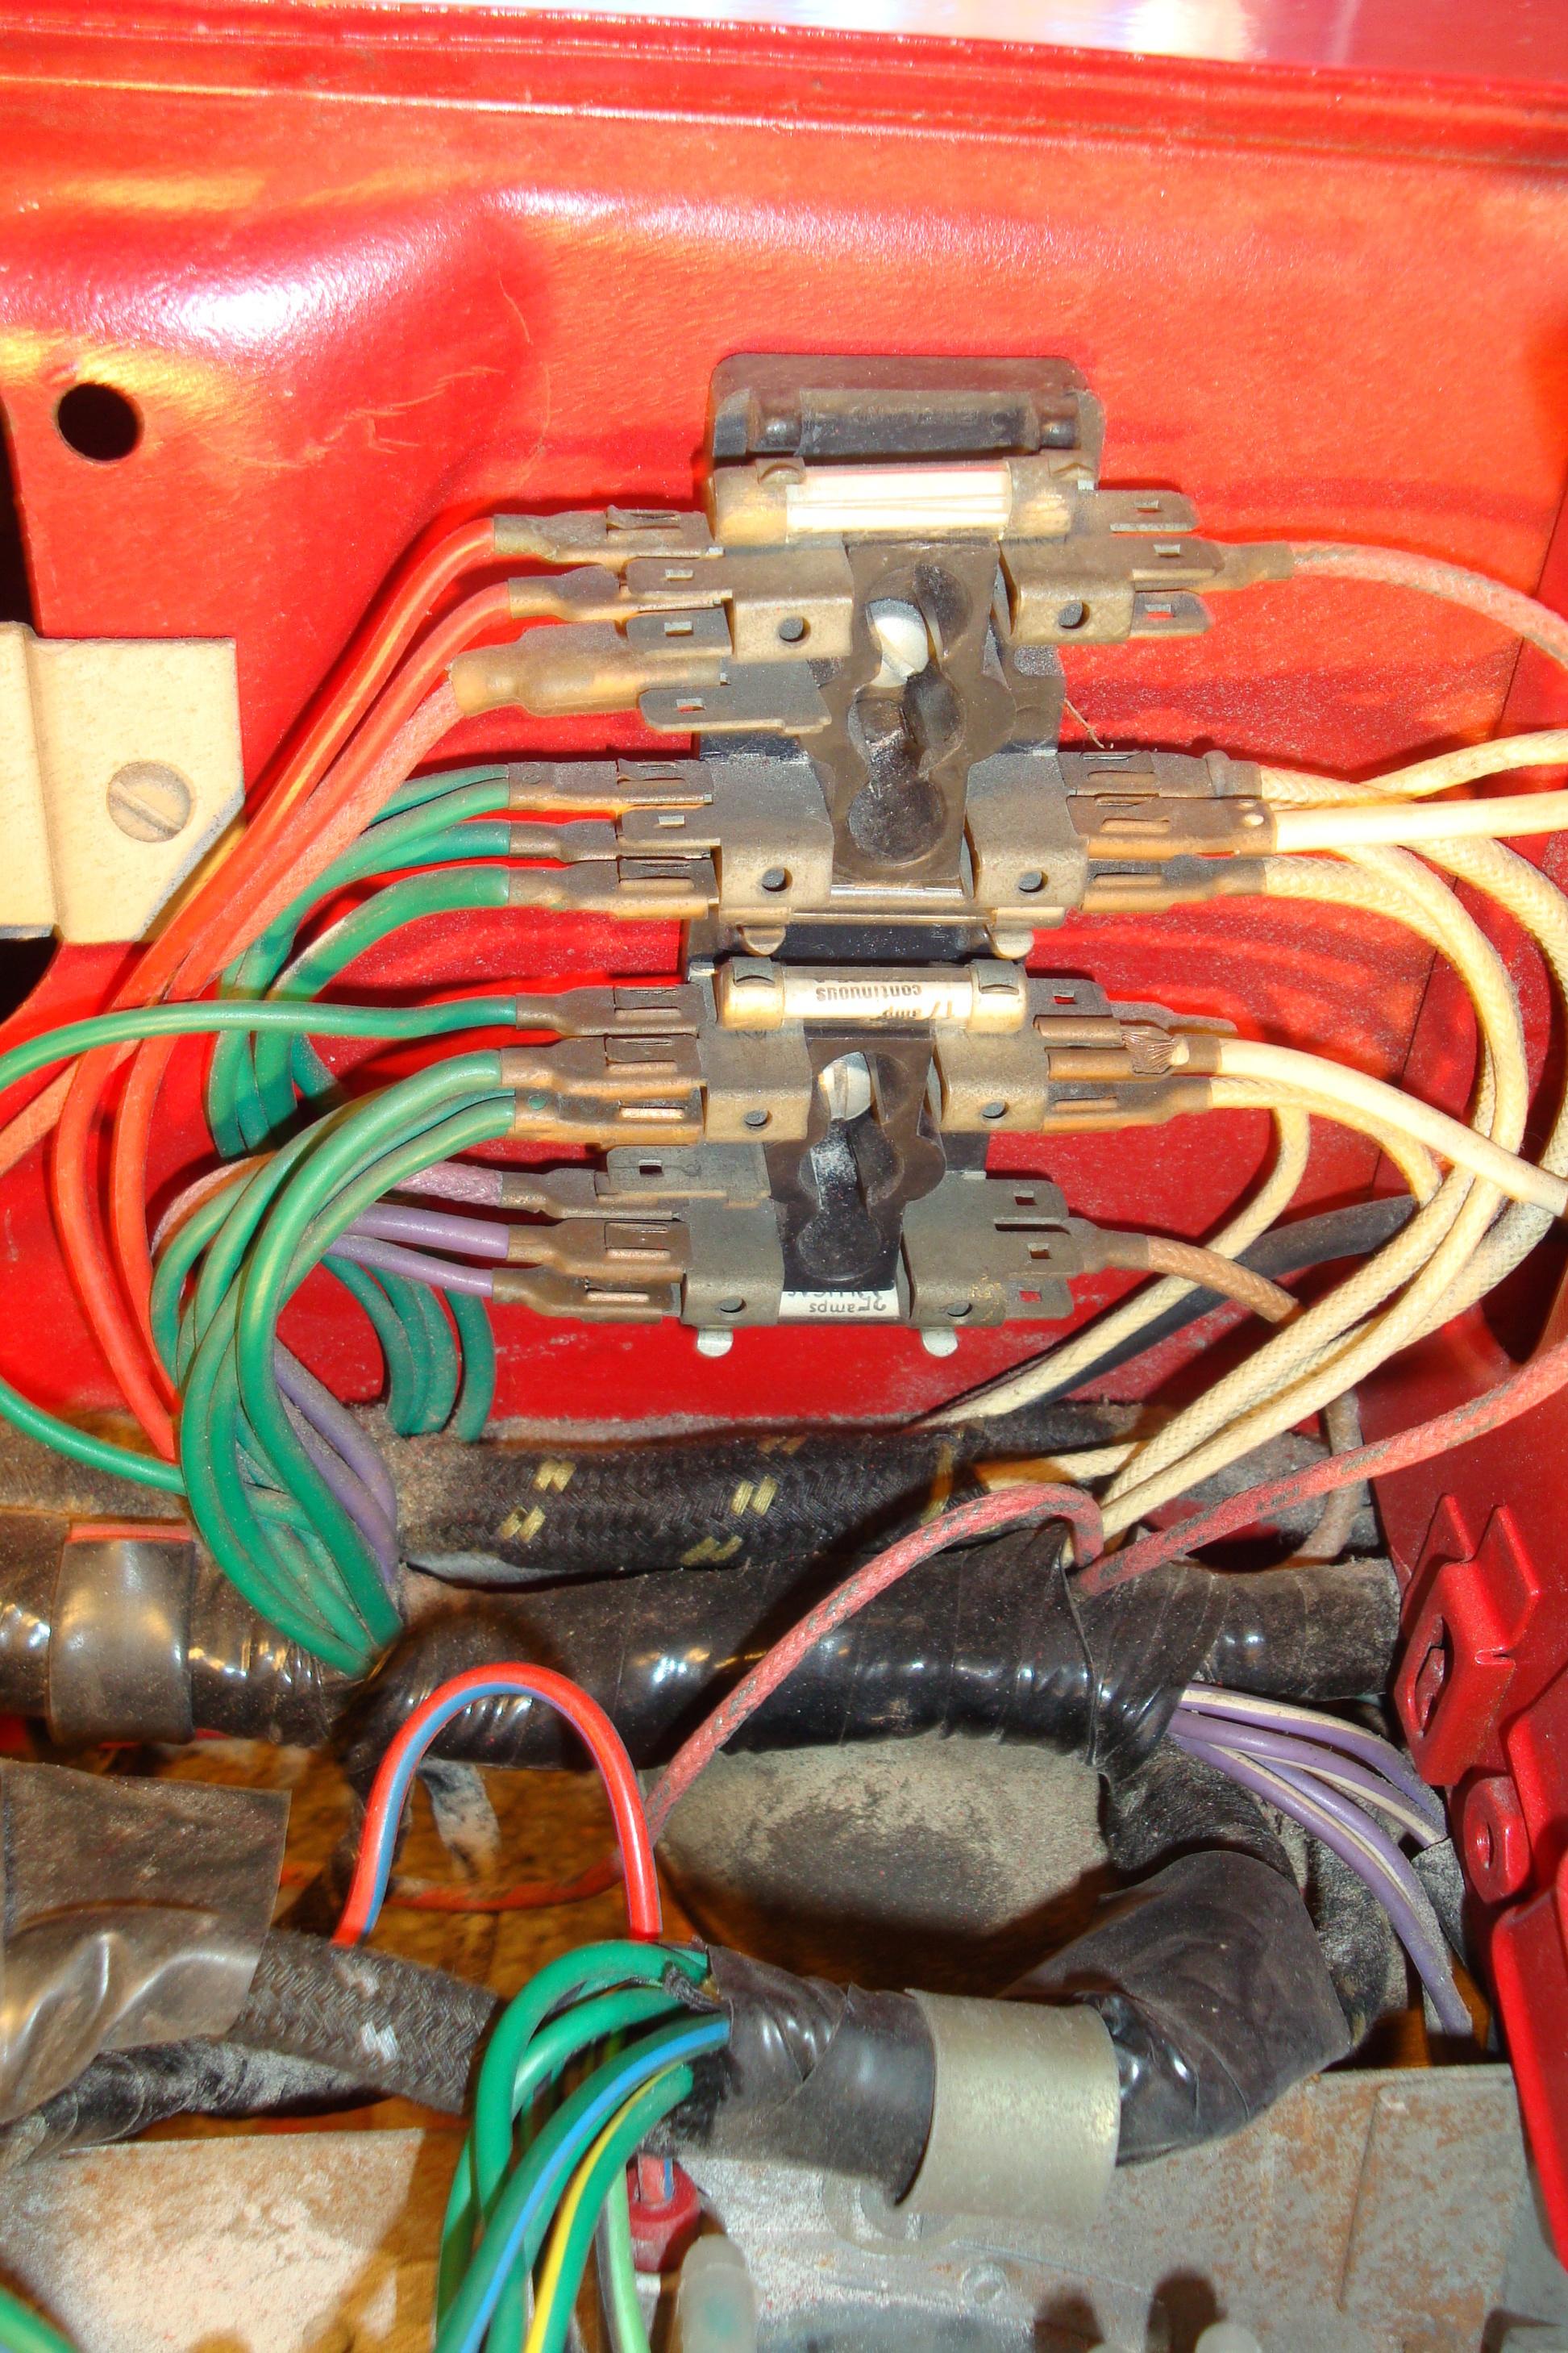 Wiring Diagram 3 Way Switches Wiring Diagrams Wiring Diagram Wiring